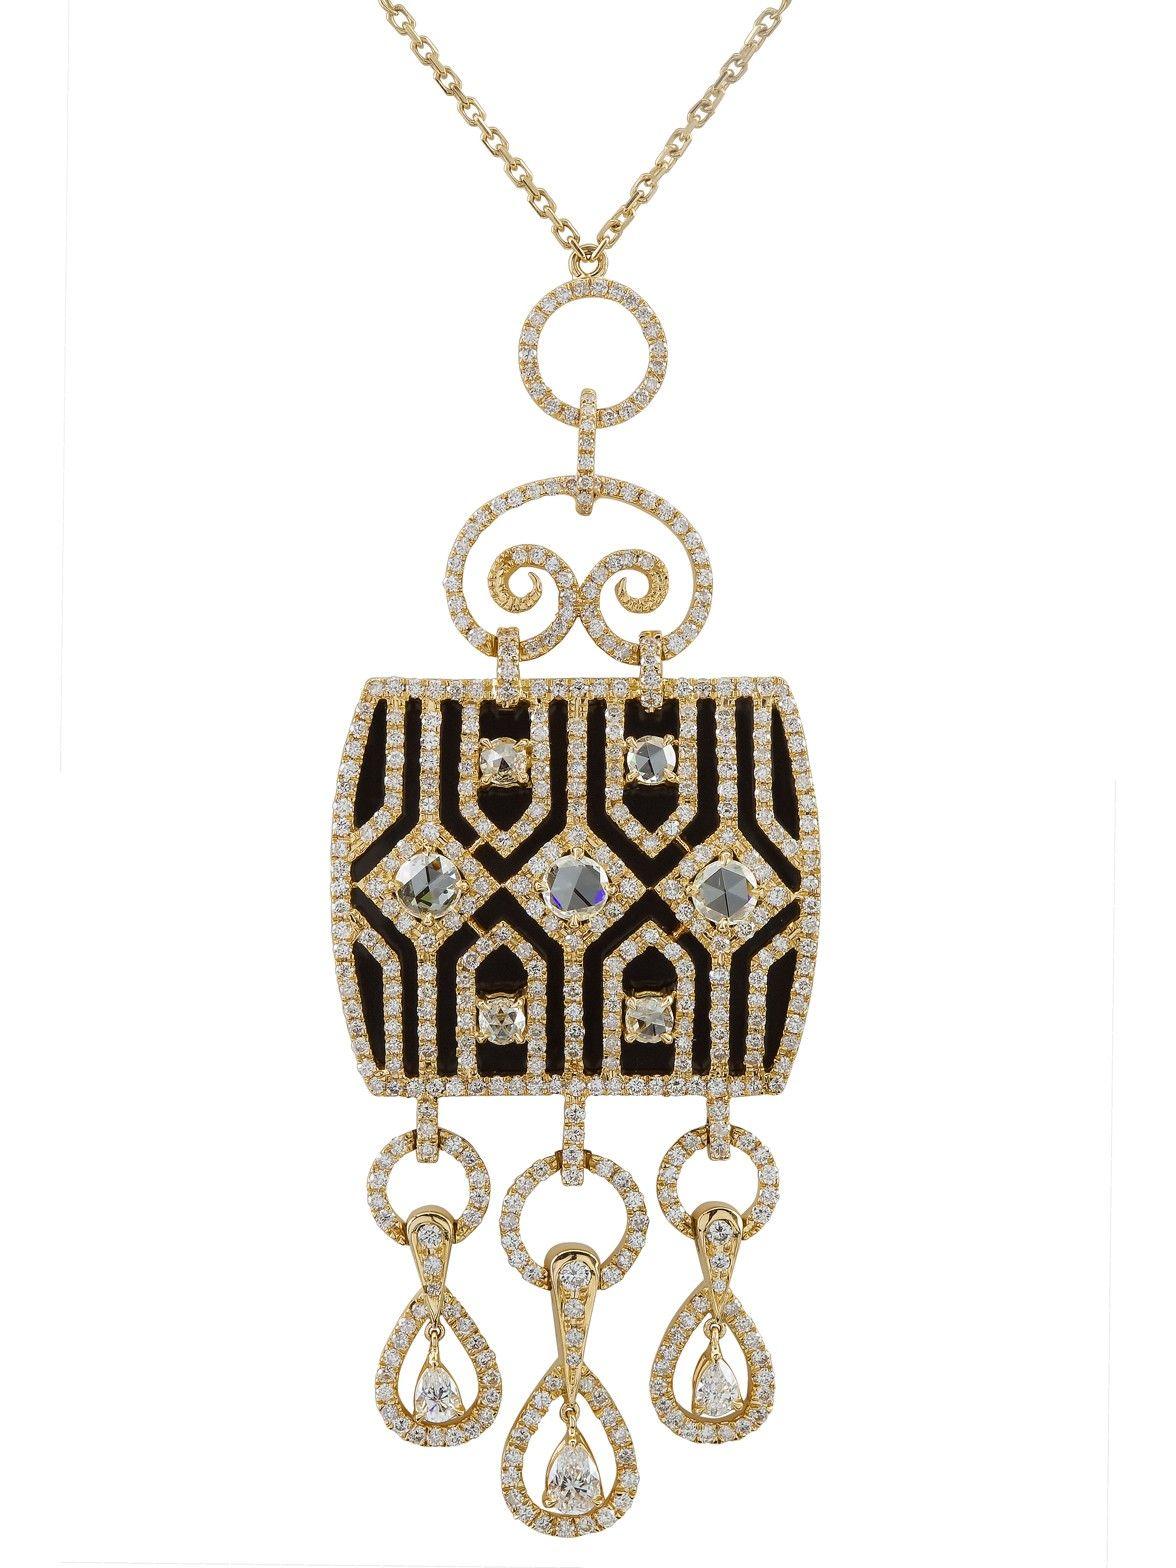 Al Zain 18k Yellow Gold Diamond and Black Enamel Pendant Necklace